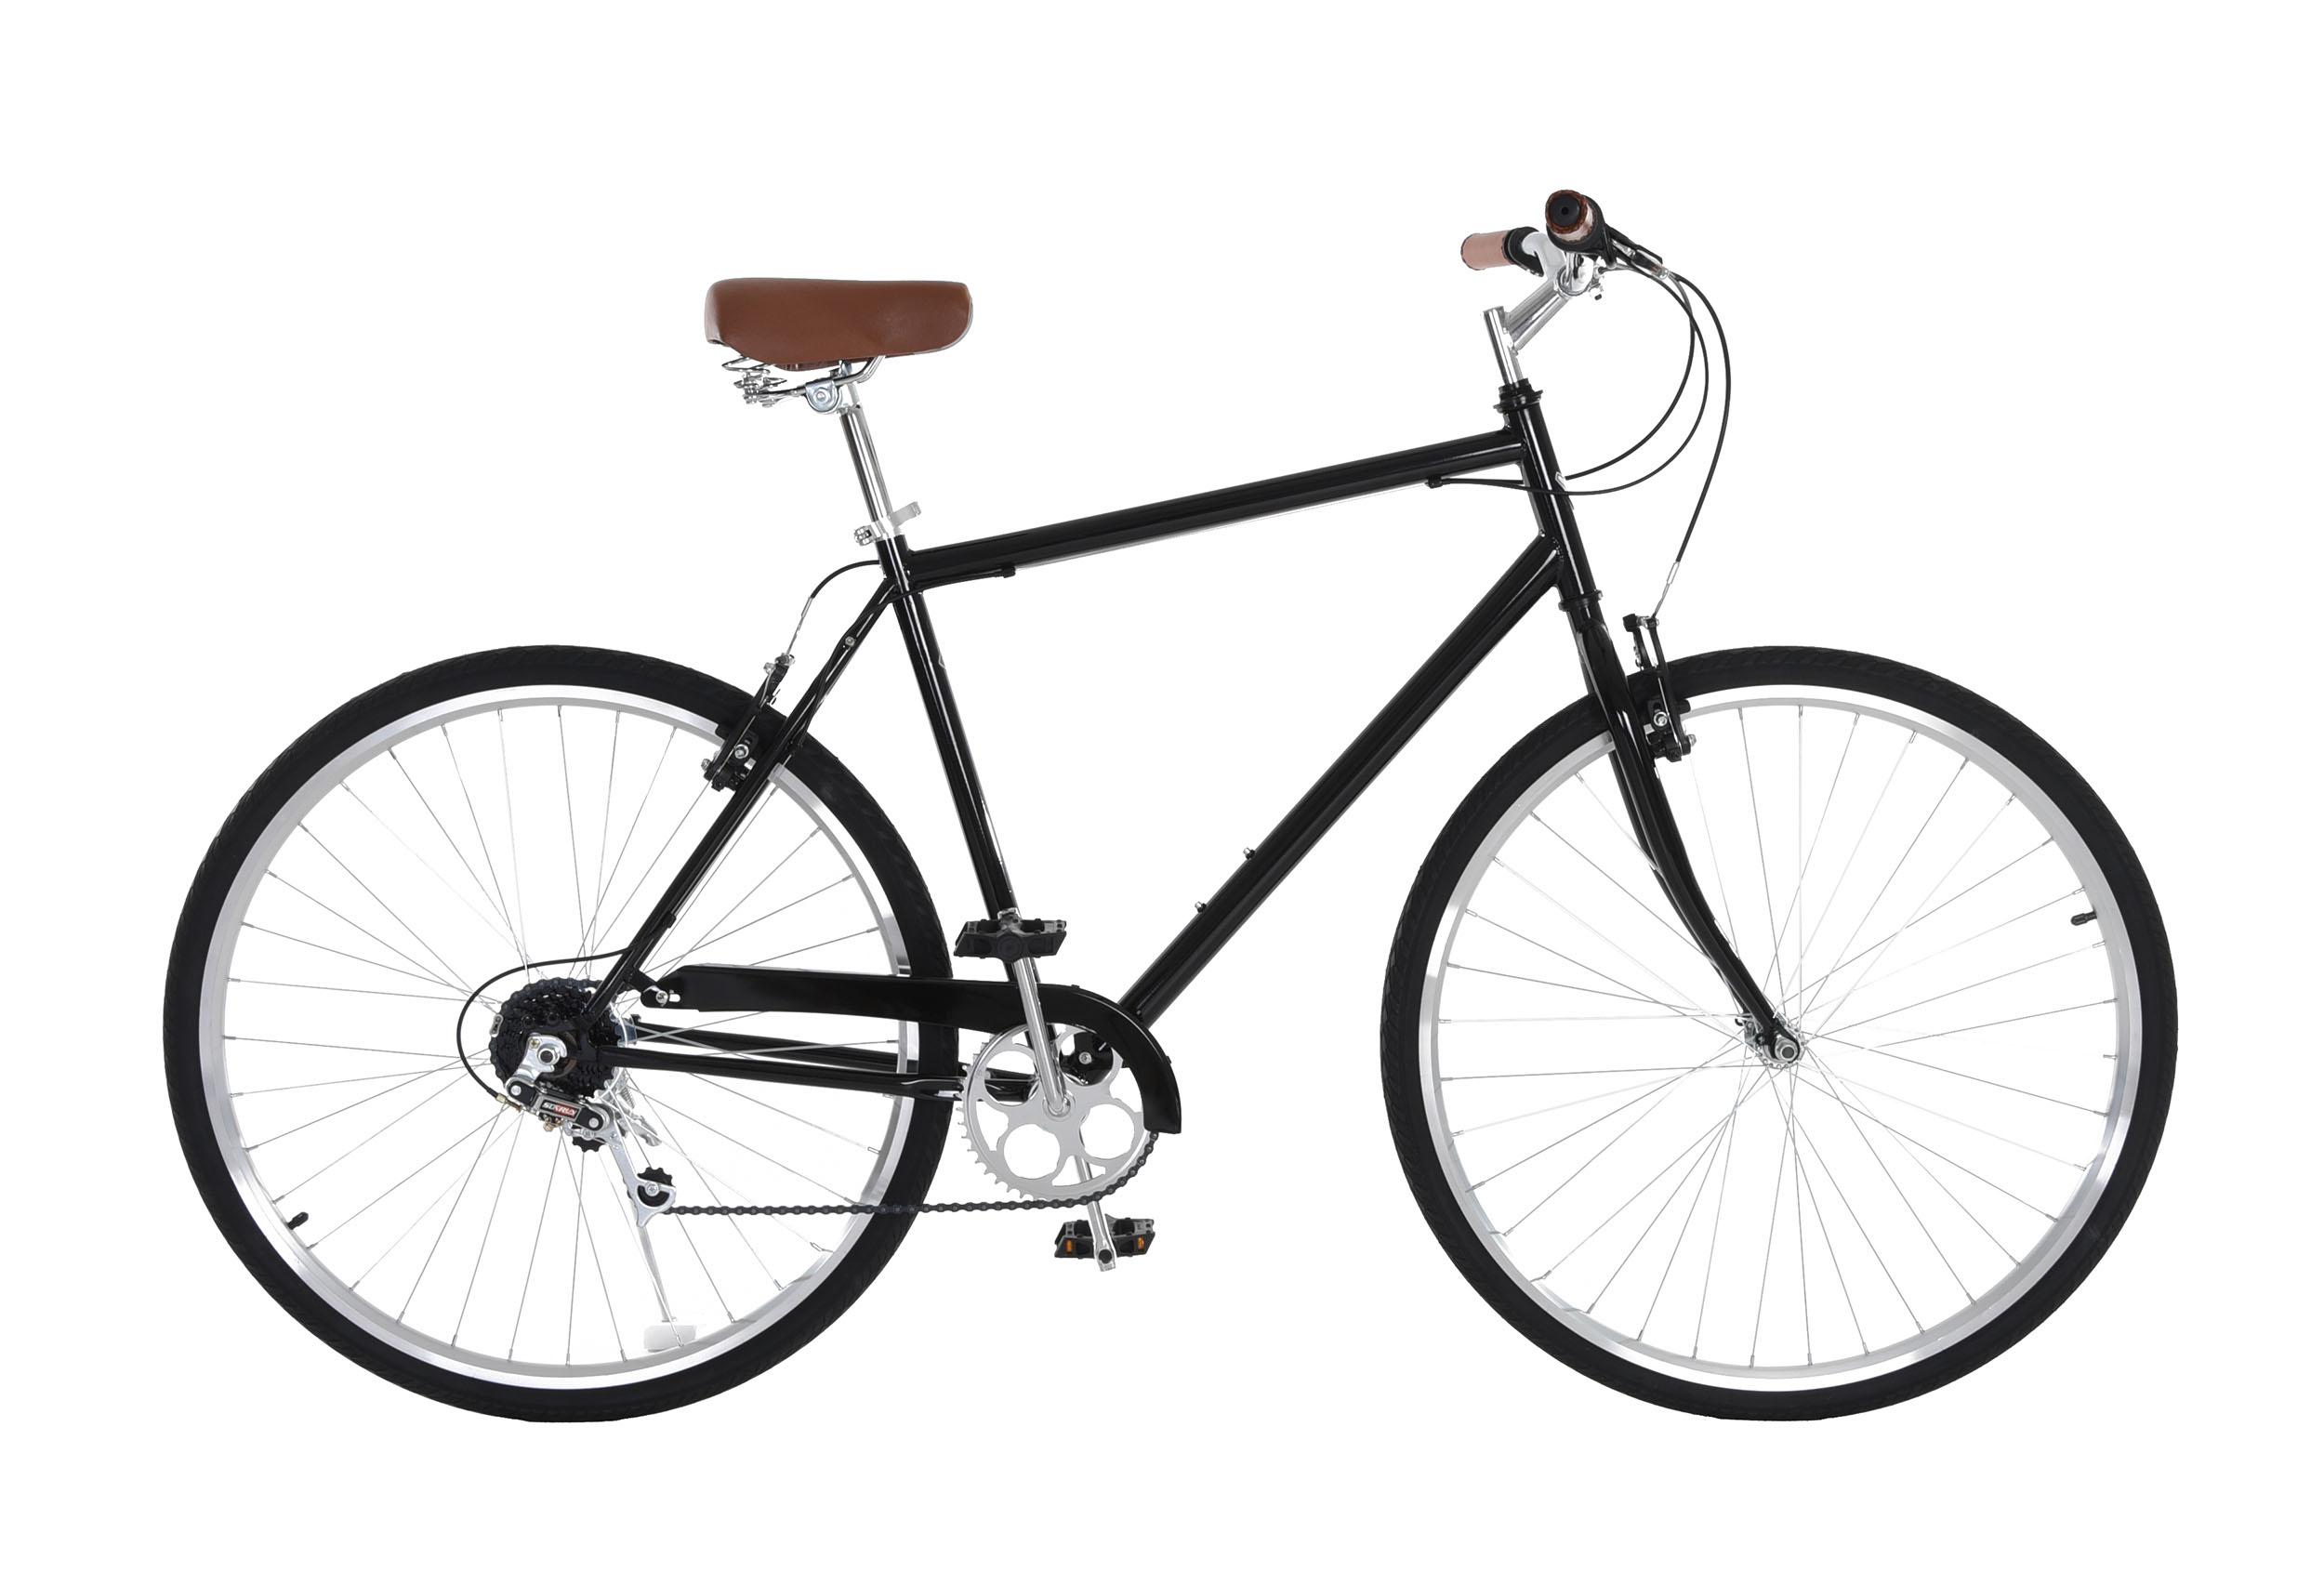 Vilano Vilano Mens Hybrid Bike 700c Retro City Commuter